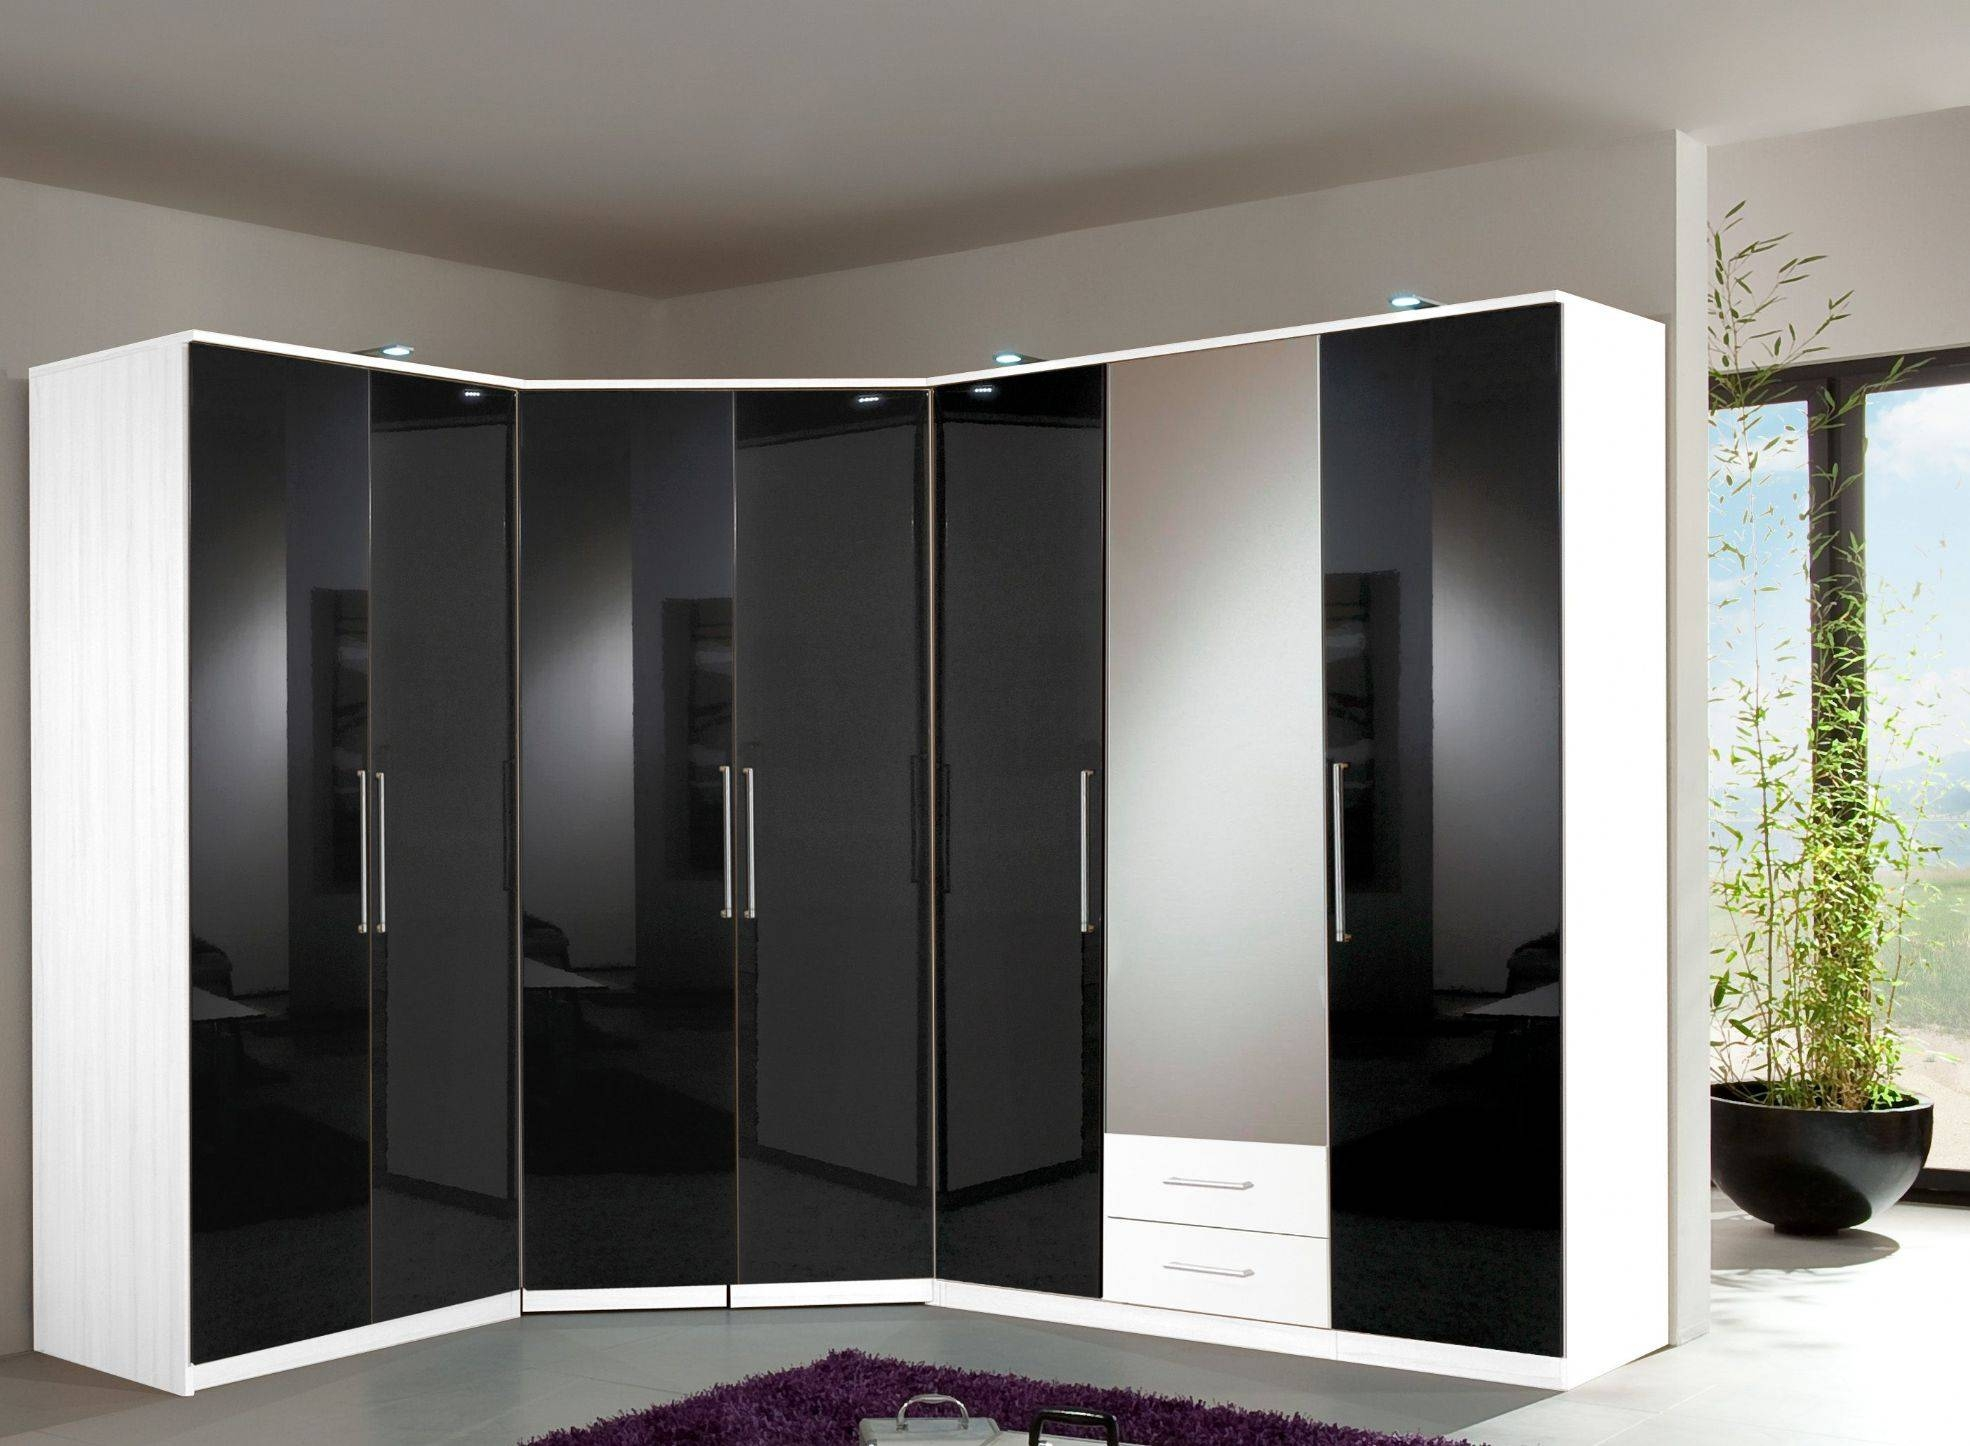 Navada Black Gloss & White 3 Door Centre Mirror Wardrobe-17 1 for Black Gloss 3 Door Wardrobes (Image 13 of 15)